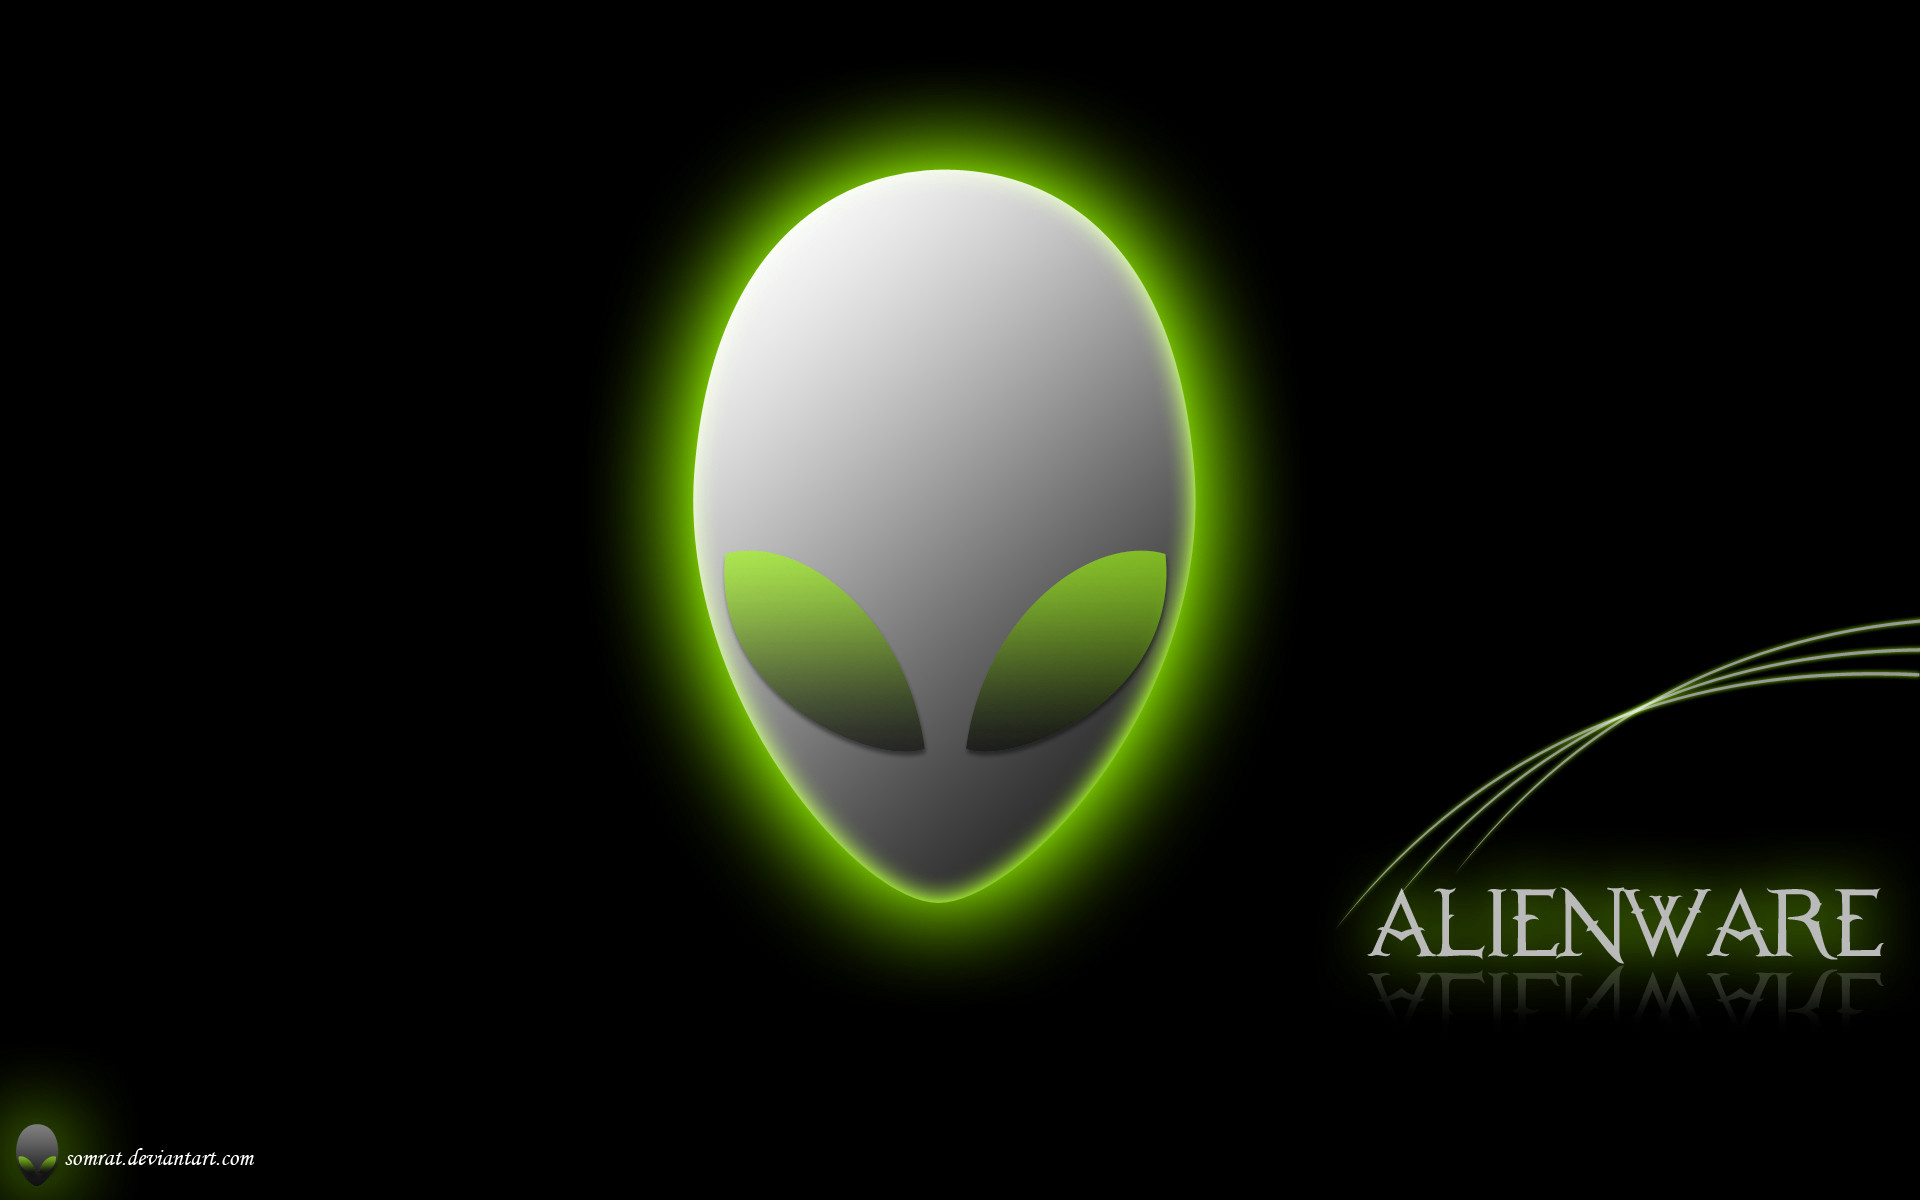 Rainbow Alienware Green by darkangelkrys on DeviantArt